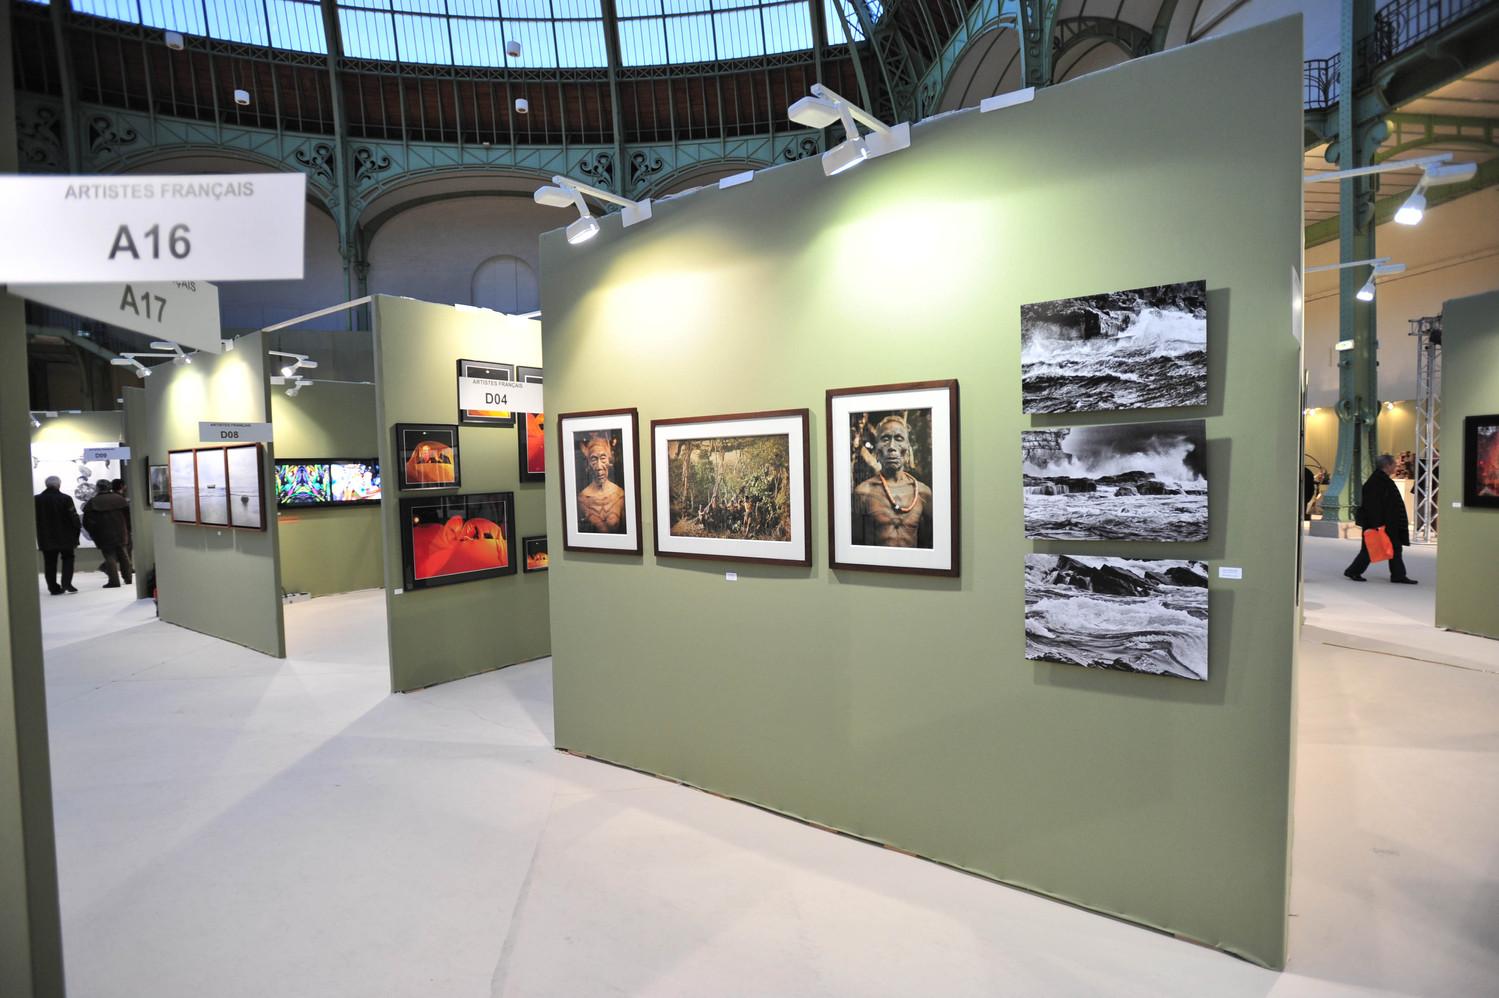 Grand-Palais exposition, Joel Cadiou